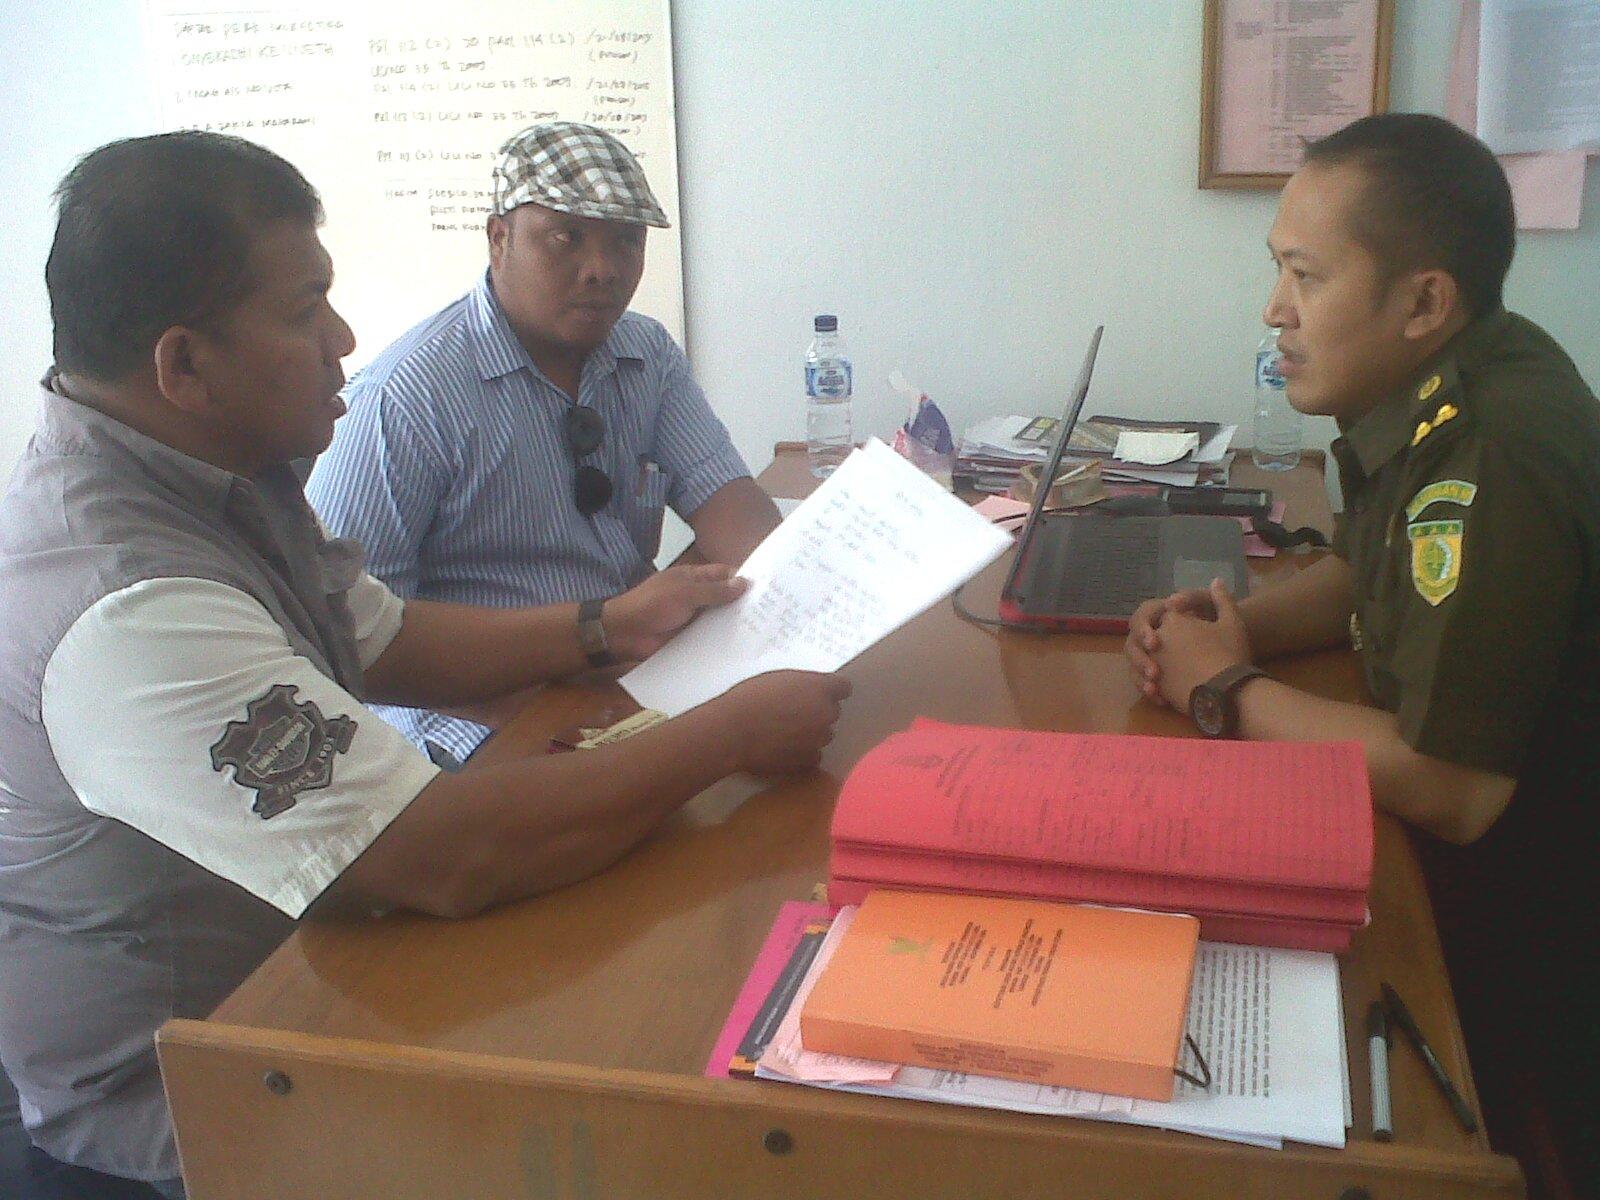 Tampak Tim Venna, Ramos Taek Berek didampingi pengacara melaporkan dugaan penggunaan keuangan daerah, oleh Kepala BPP Belu, untuk memenangkan paket Fansmu NKRI.